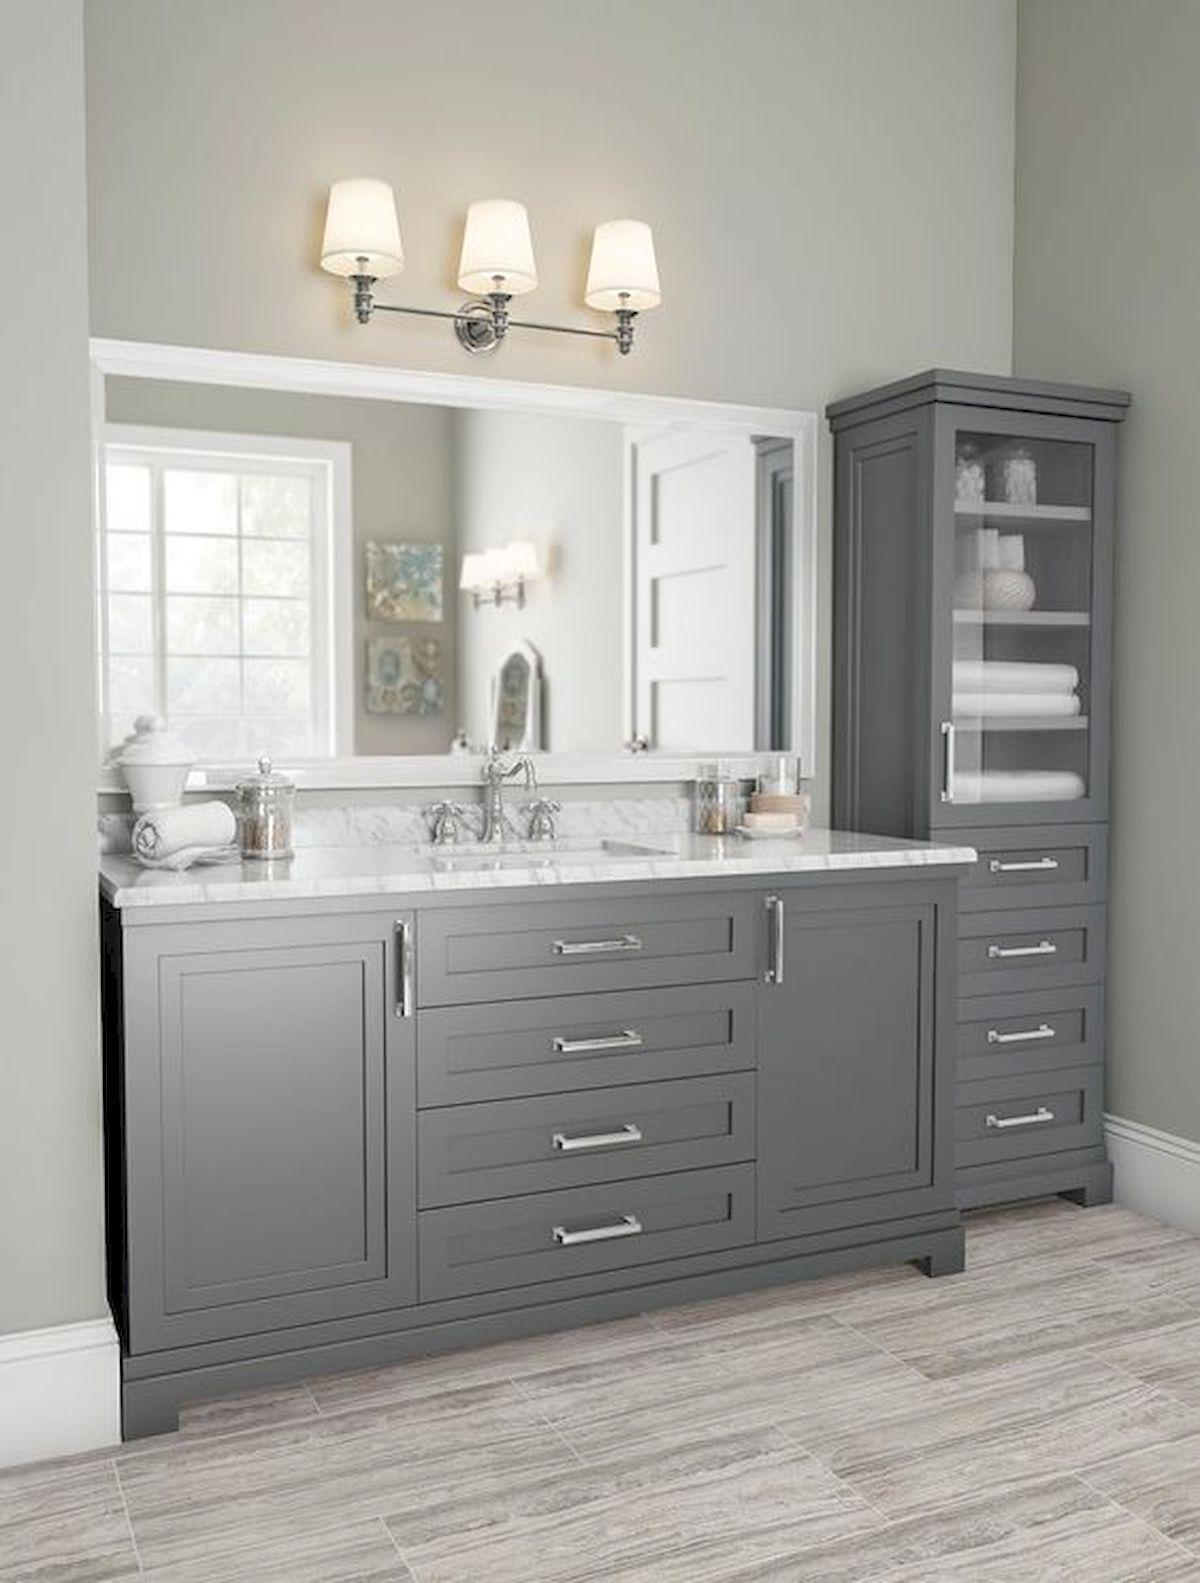 60 Fantastic Farmhouse Bathroom Vanity Decor Ideas And Remodel